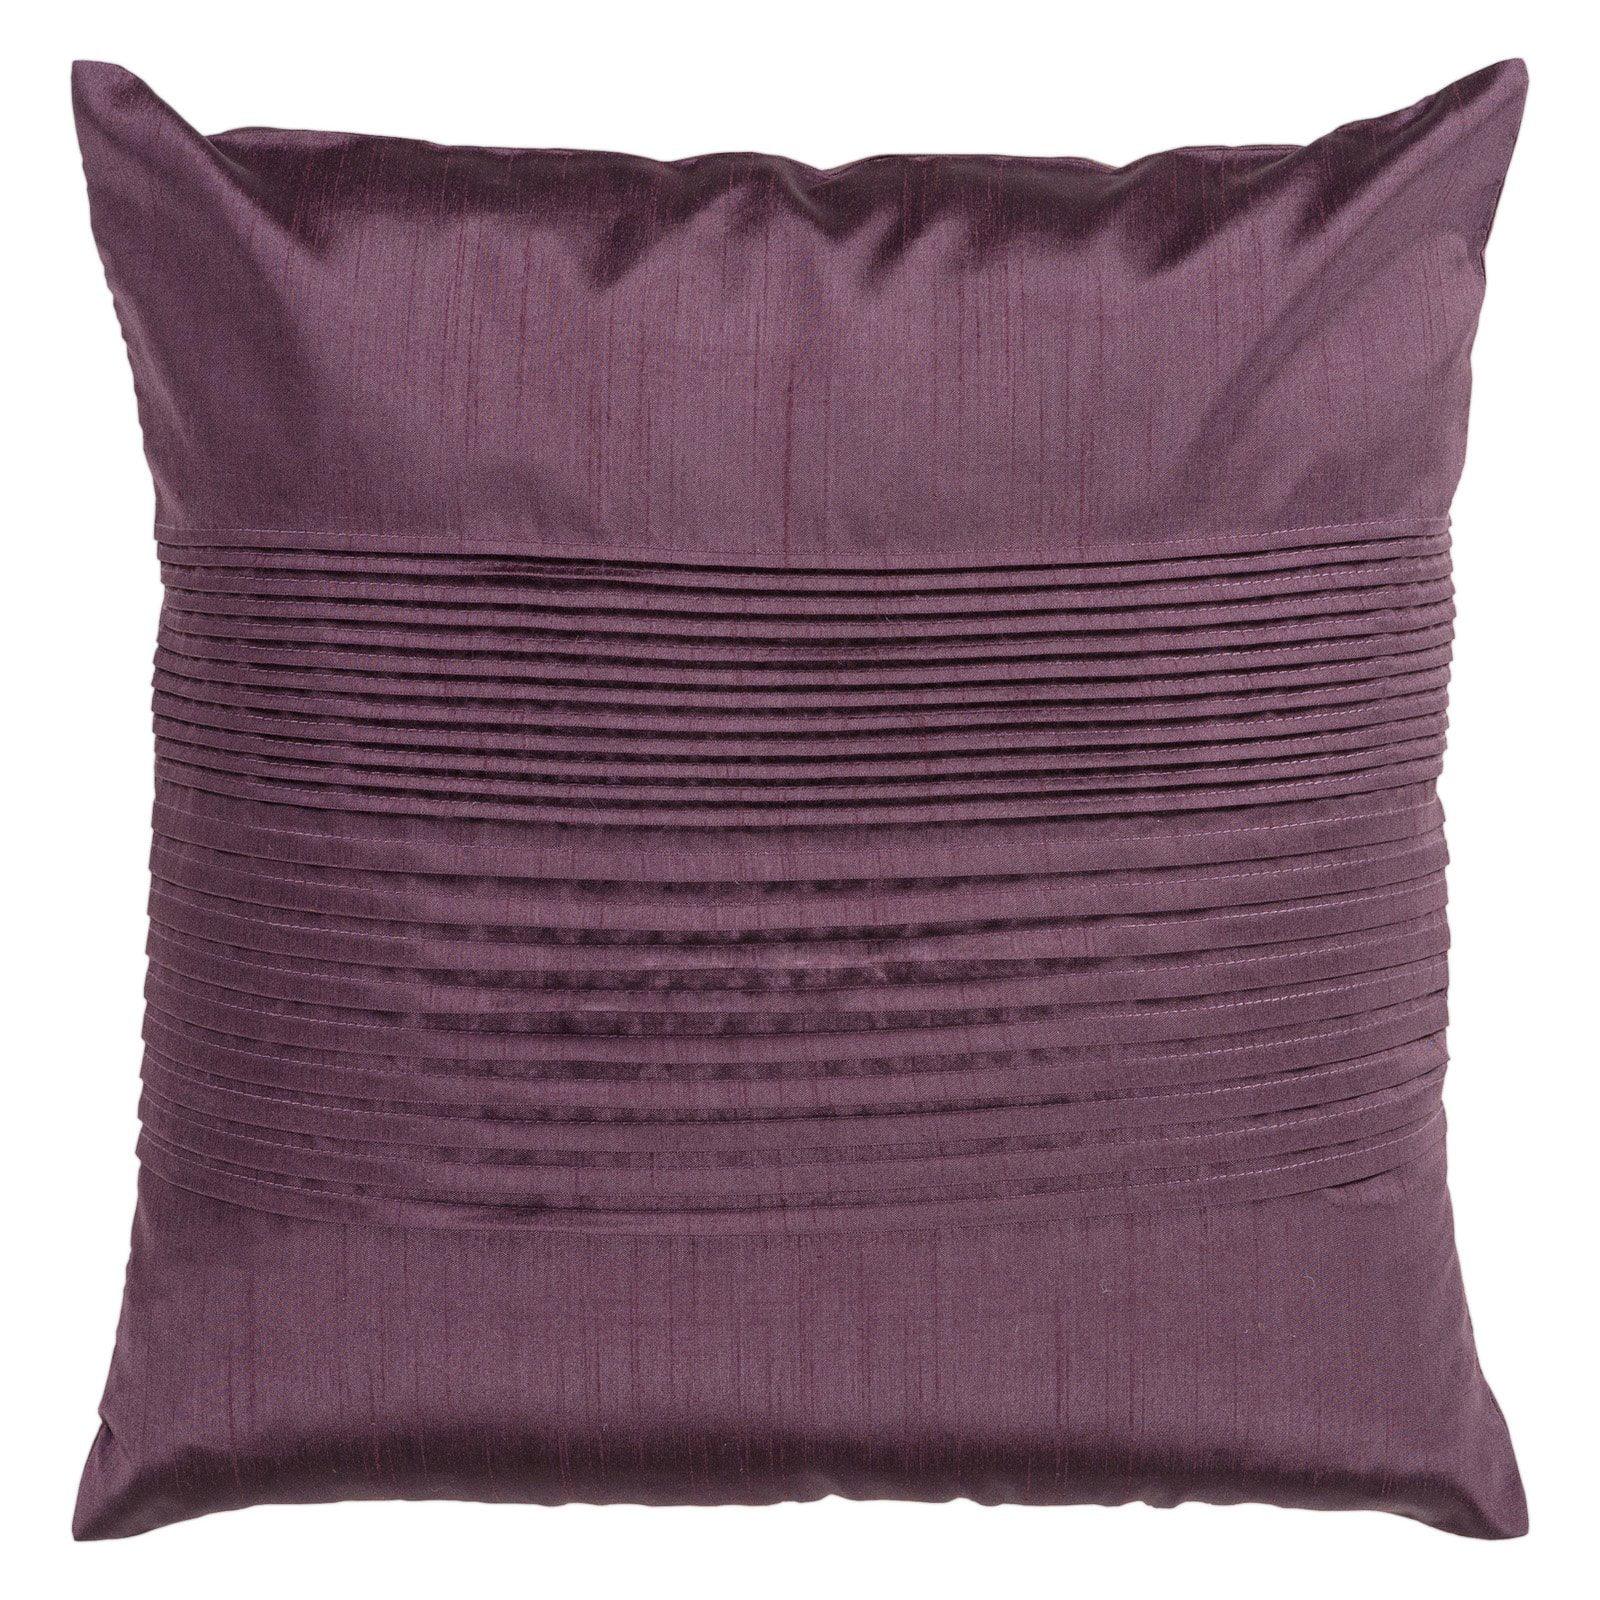 Surya Tracks Decorative Pillow - Plum